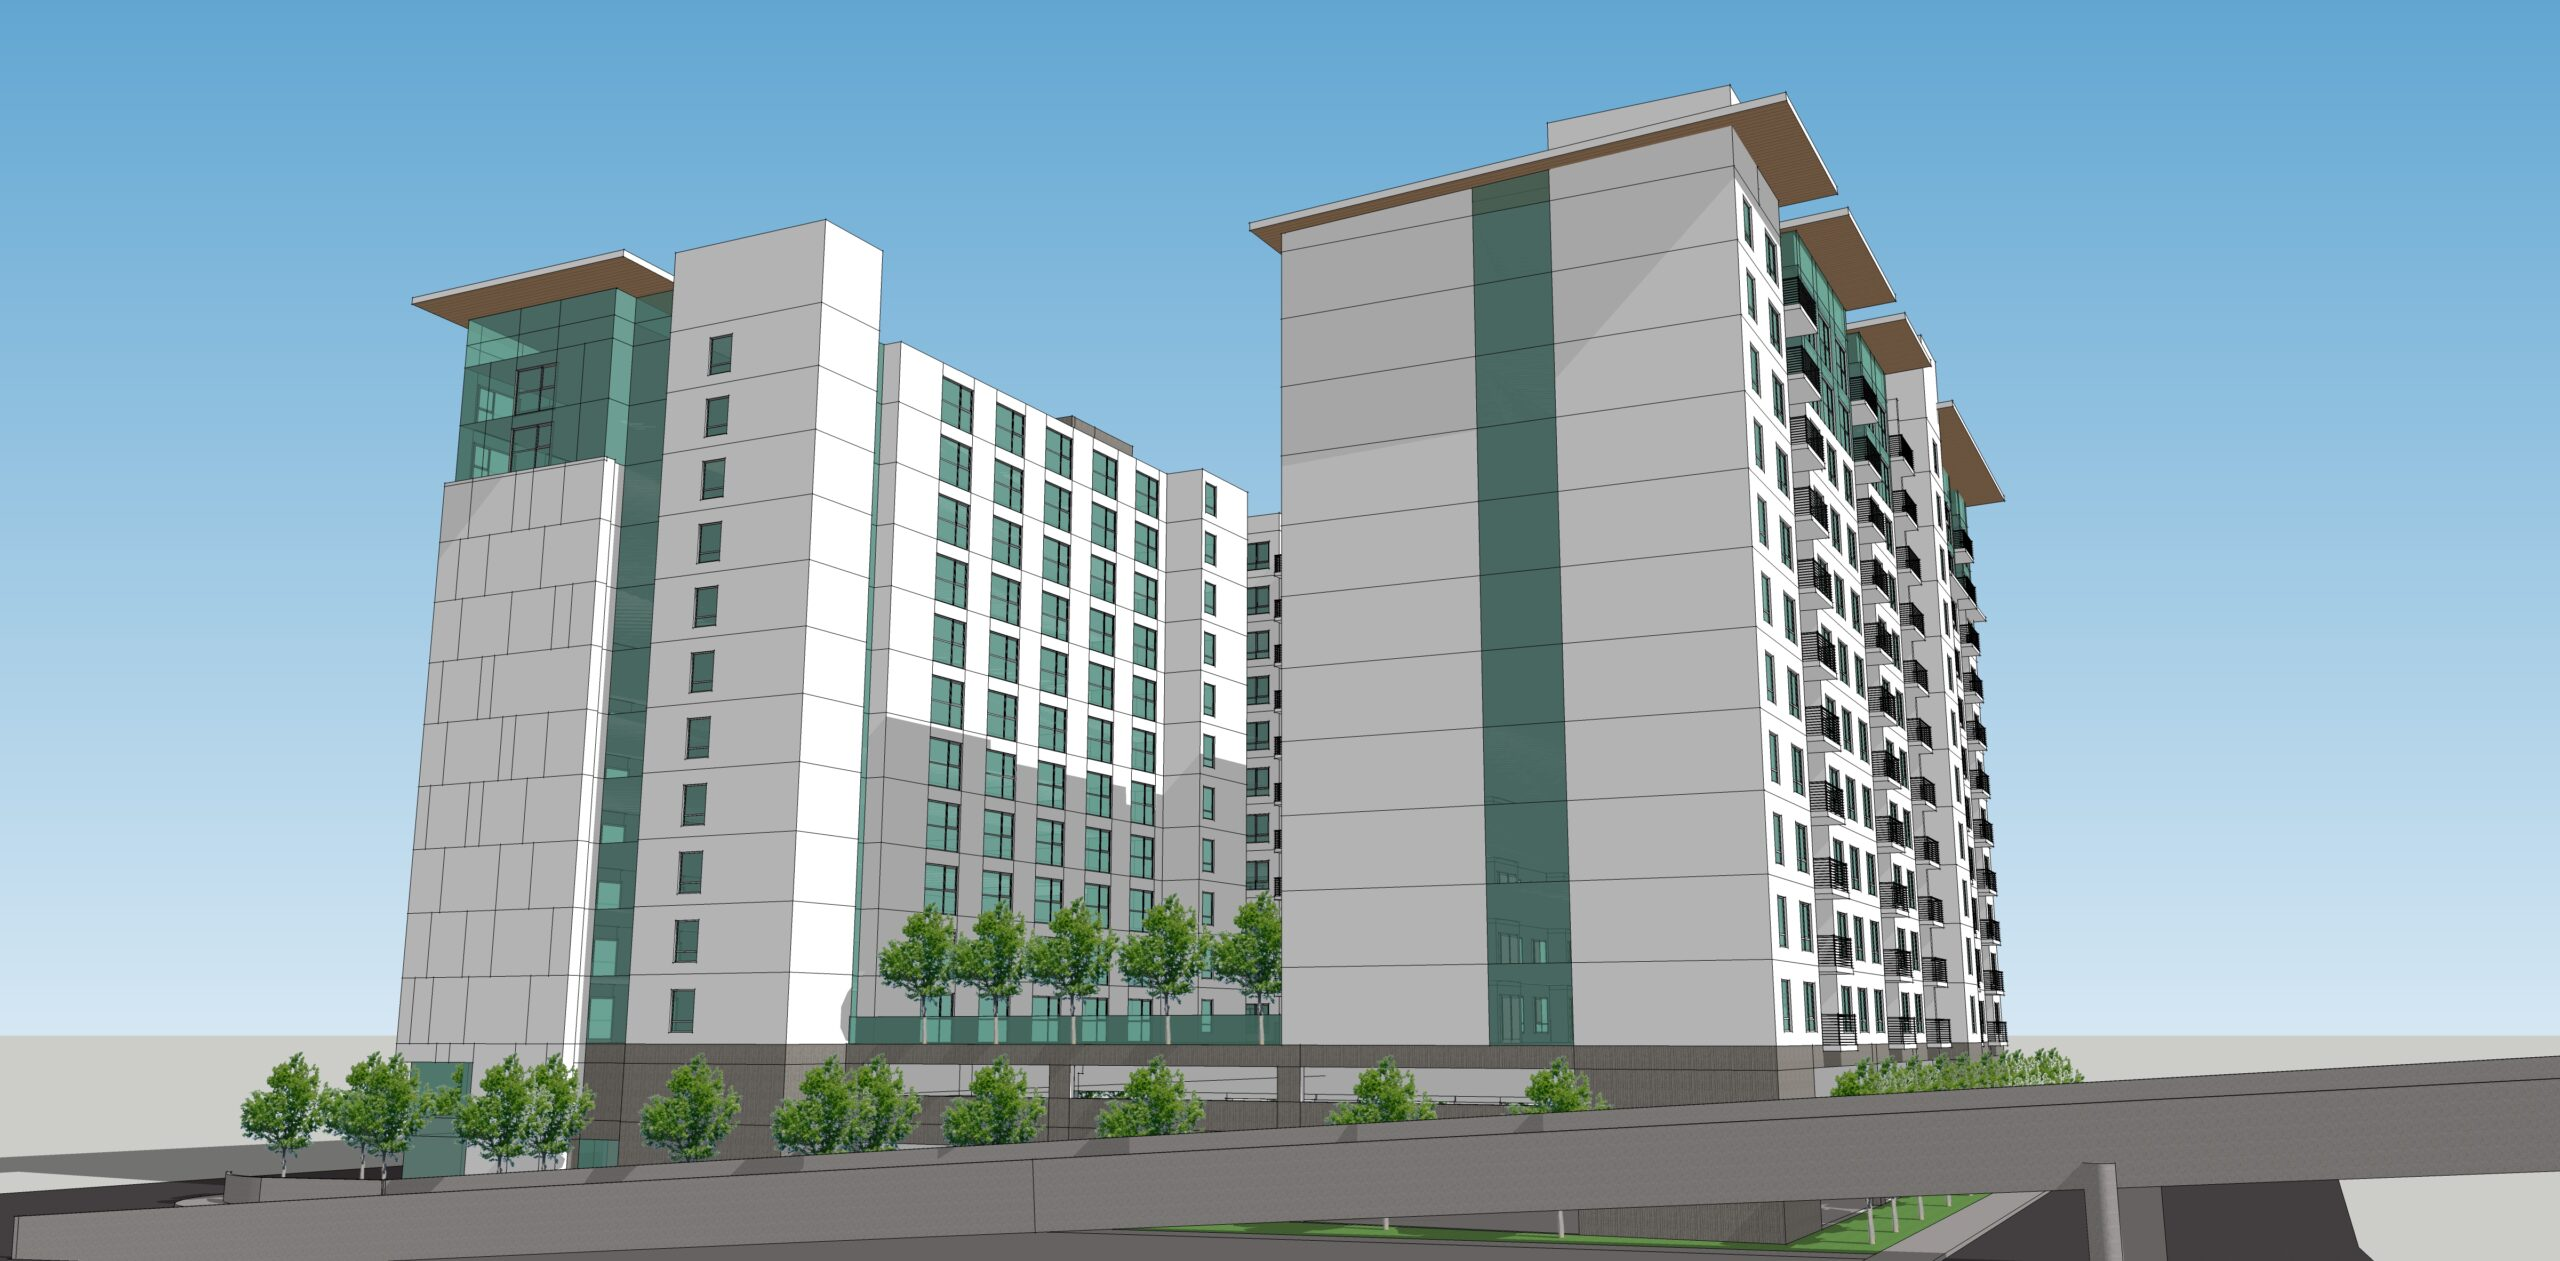 McEvoy Apartments preliminary concept